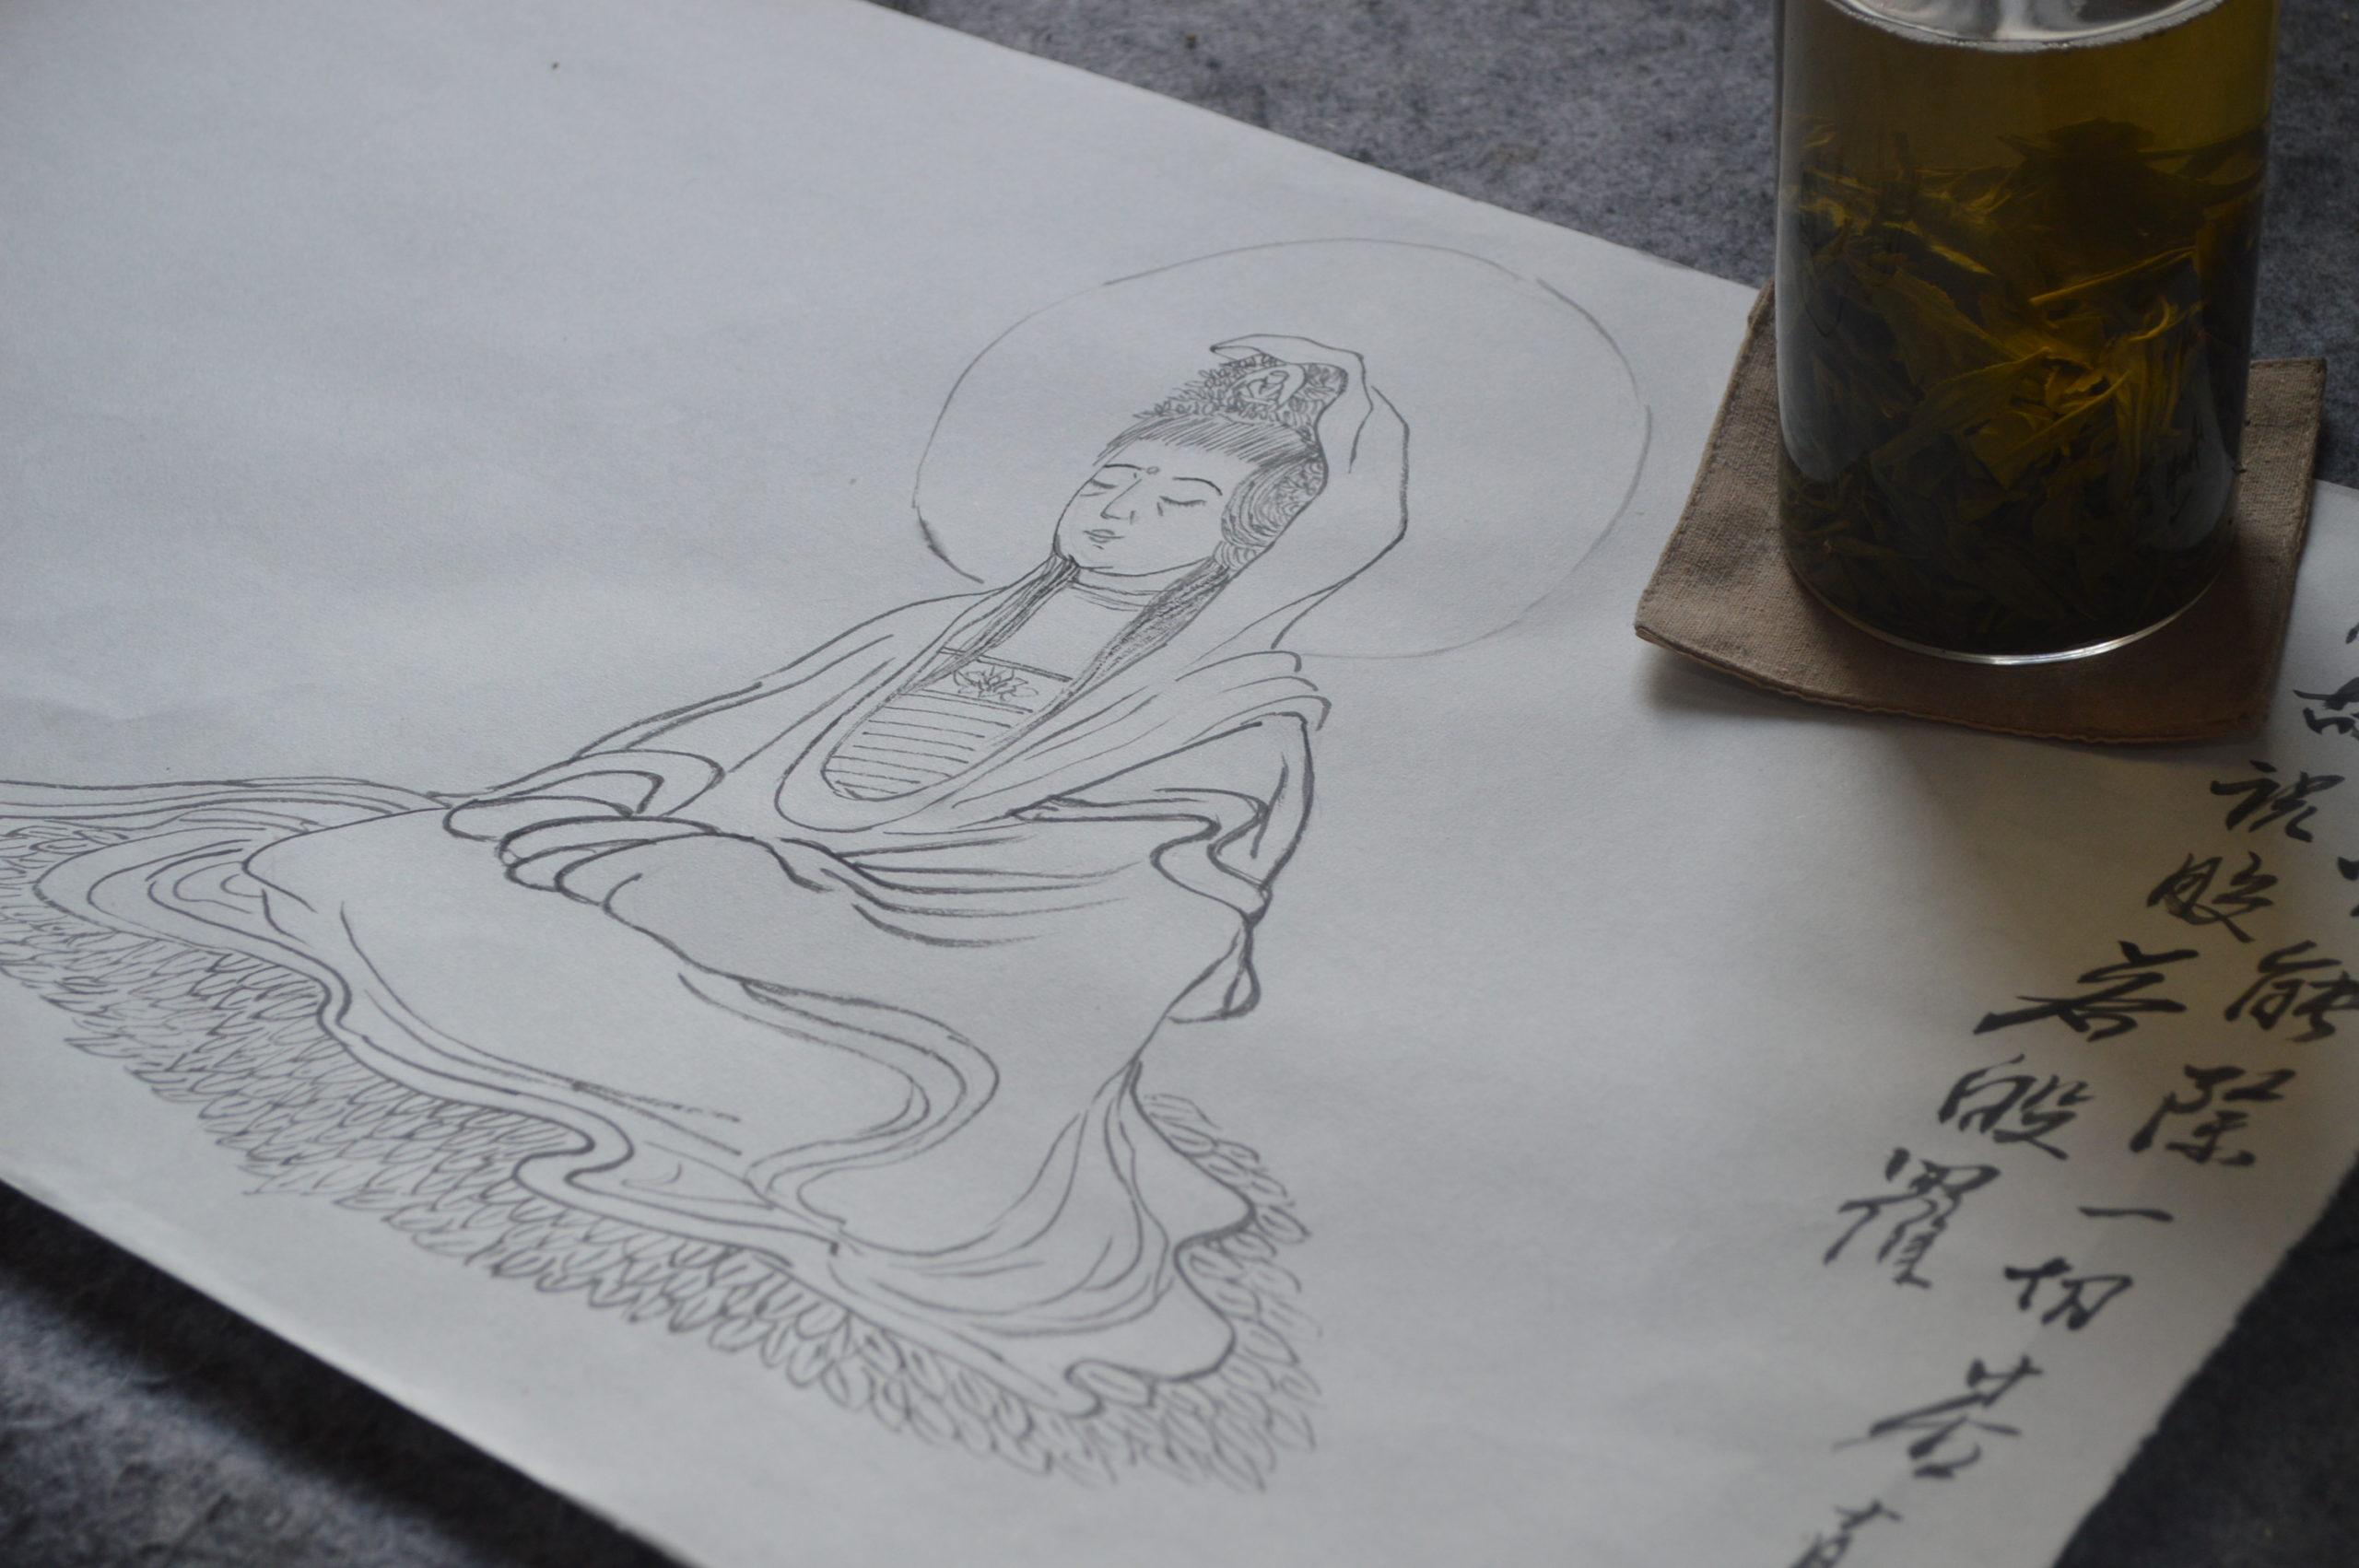 https://shop.liu-tea-art.com/wp-content/uploads/2020/08/DSC_0003-scaled.jpg